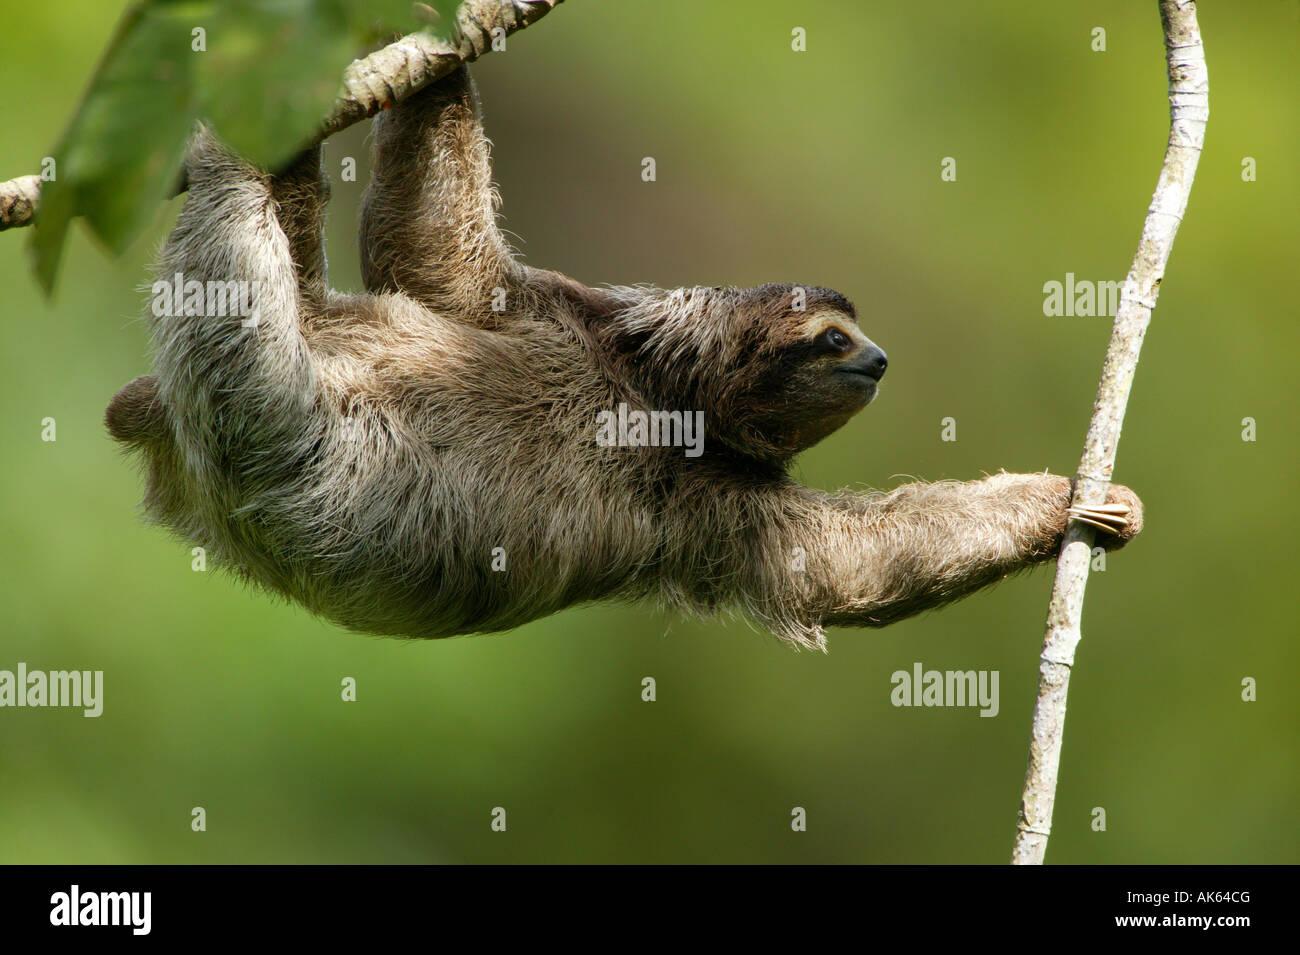 Three-toed Sloth, Bradypus variegatus, in the 265 hectares rainforest Metropolitan park, Panama City, Republic of Panama. Stock Photo